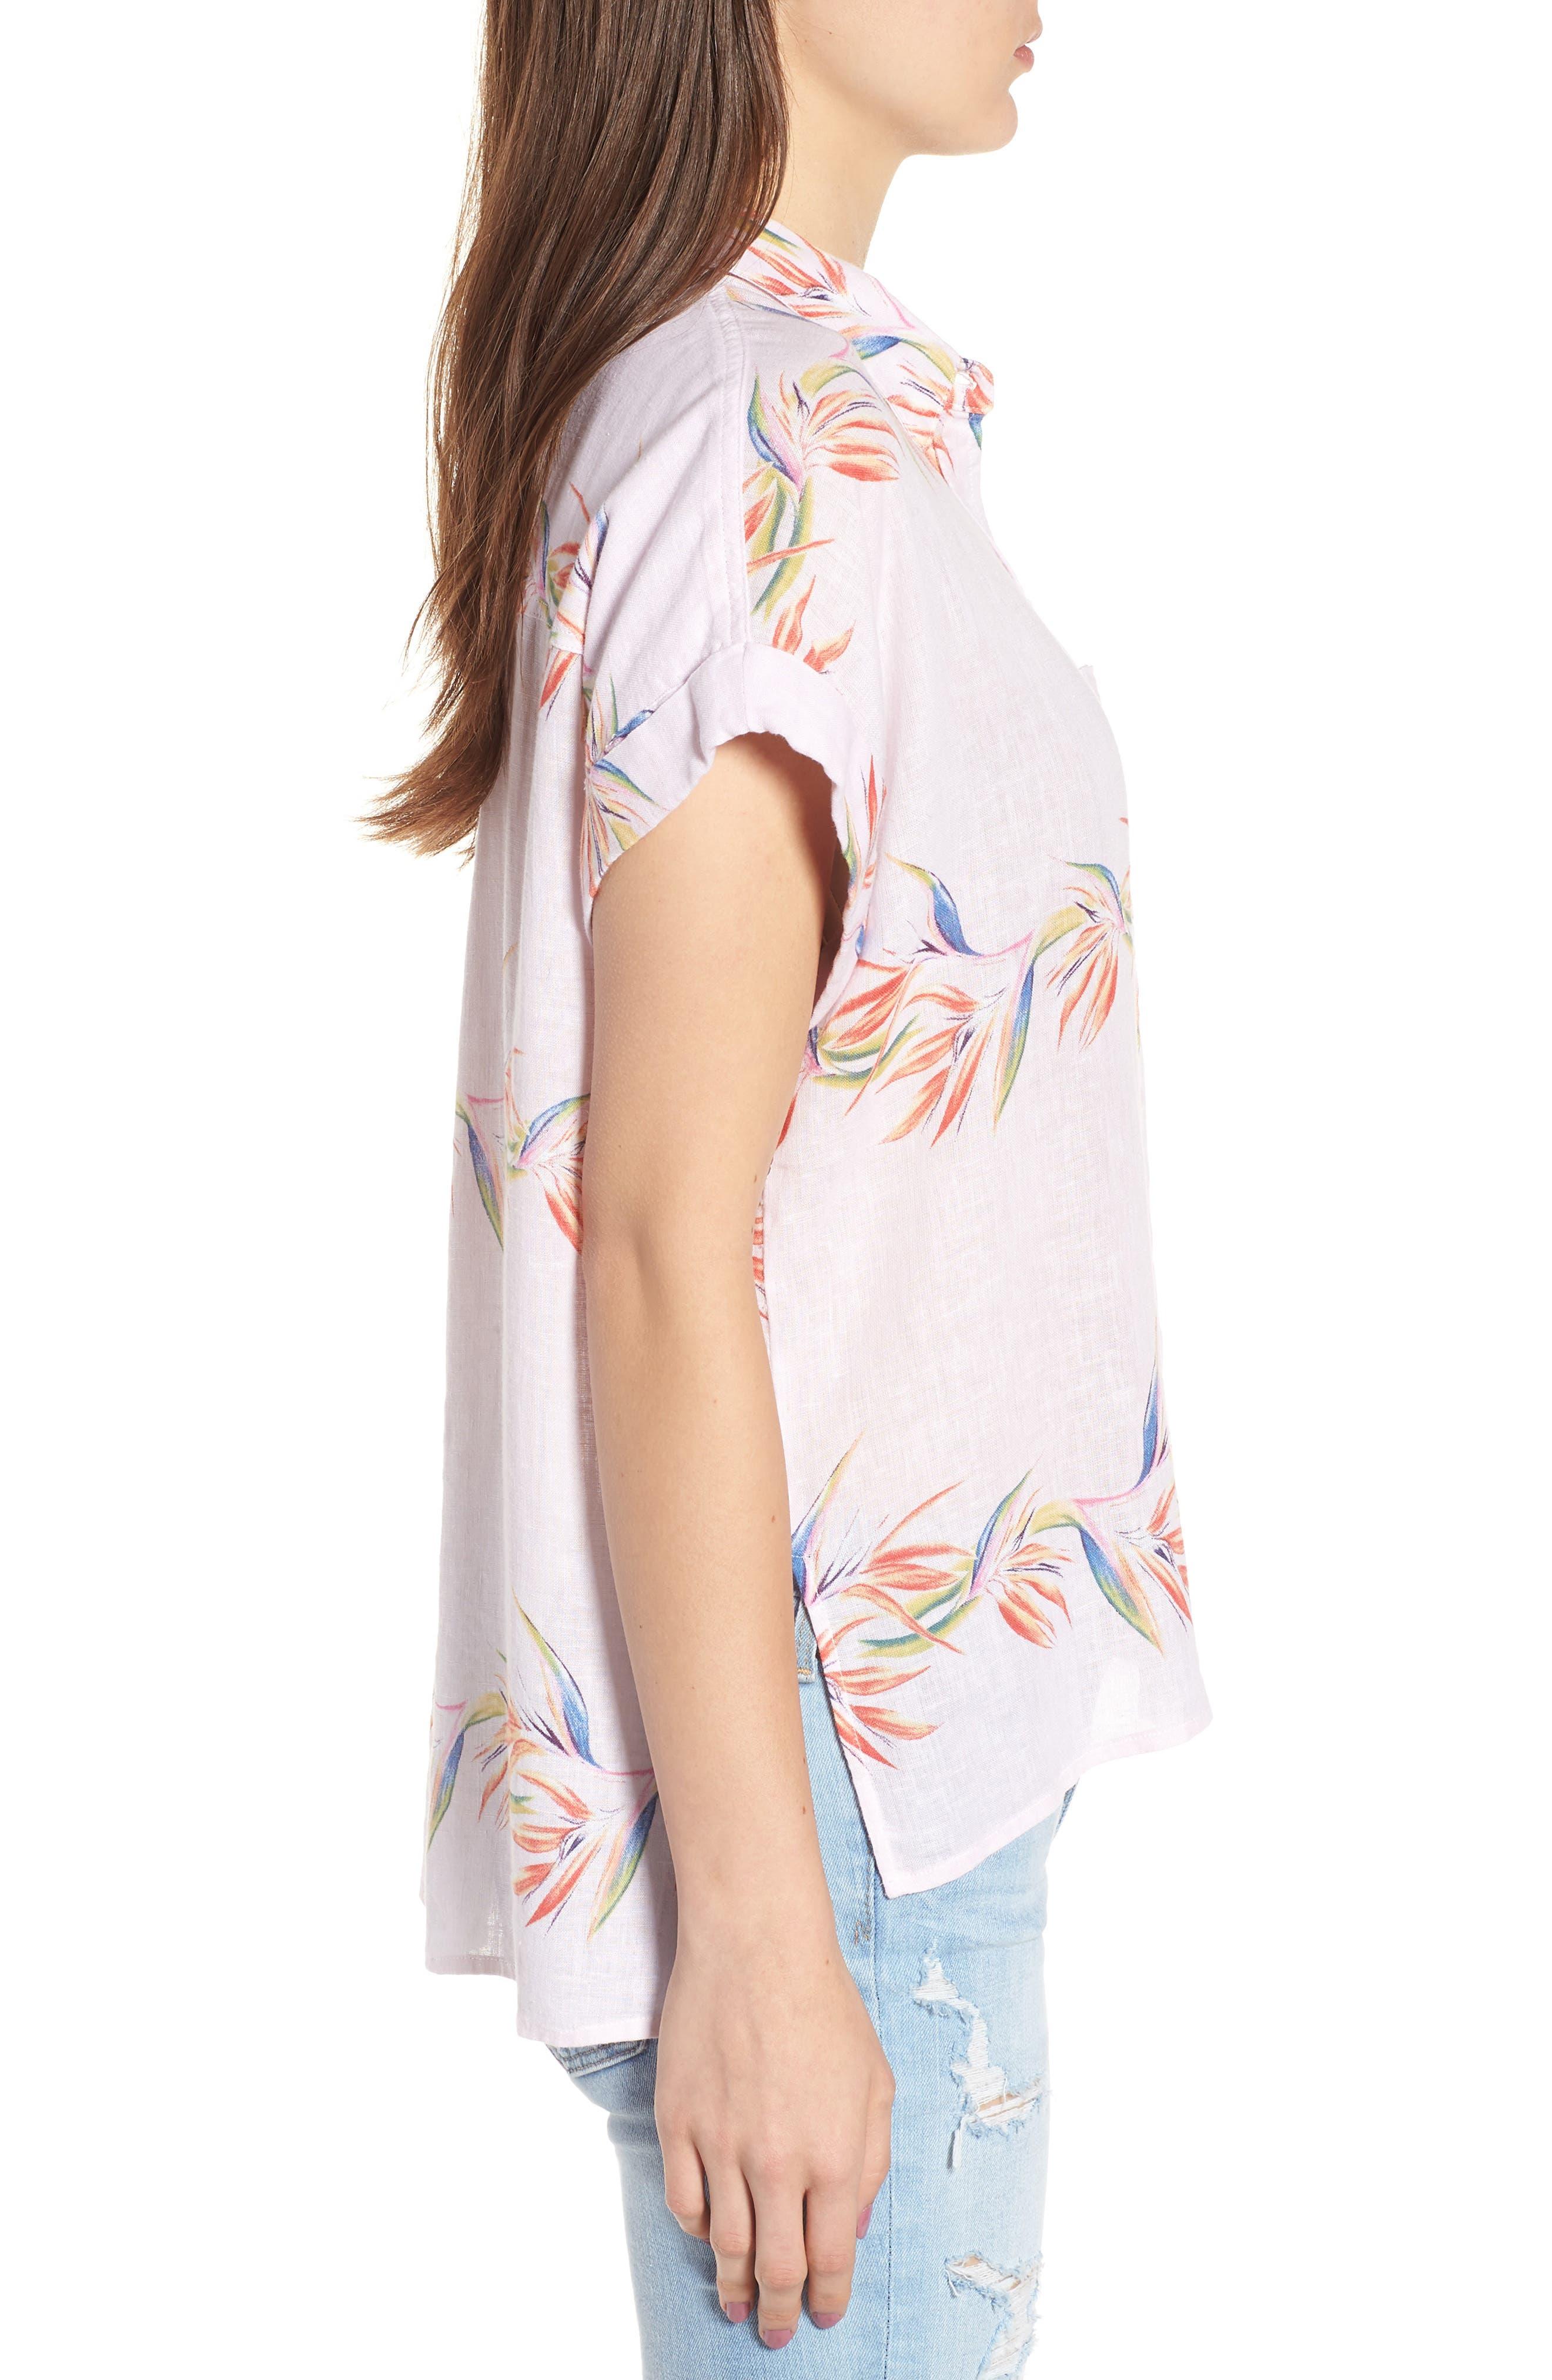 Whitney Print Shirt,                             Alternate thumbnail 3, color,                             BLUSH BIRDS OF PARADISE